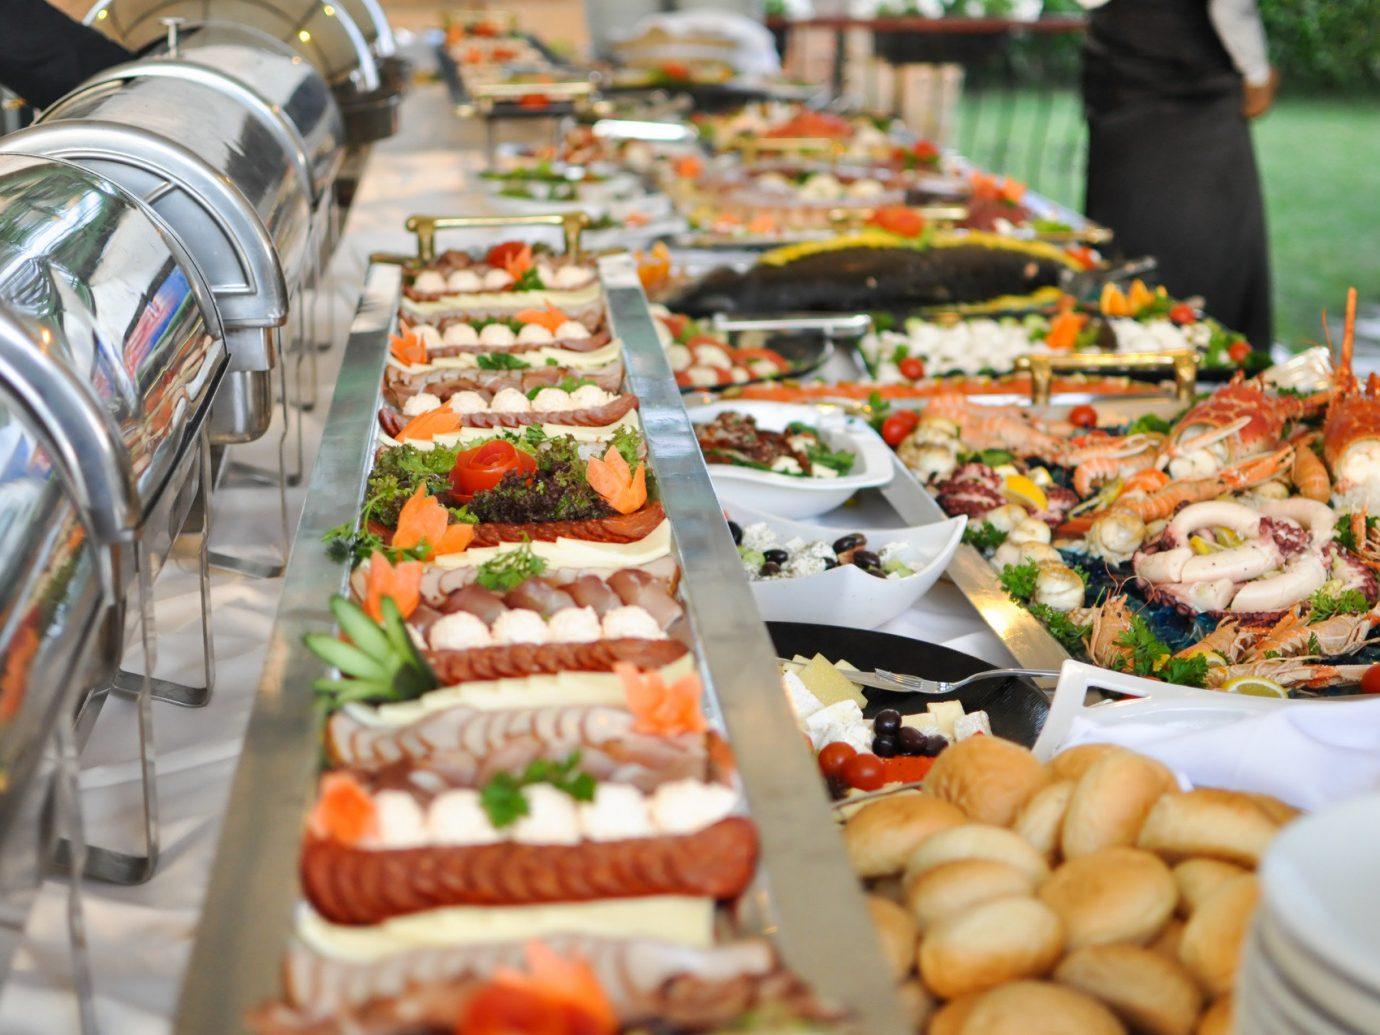 Health + Wellness Travel Tips food meal buffet brunch dish breakfast sense hors d oeuvre cuisine several